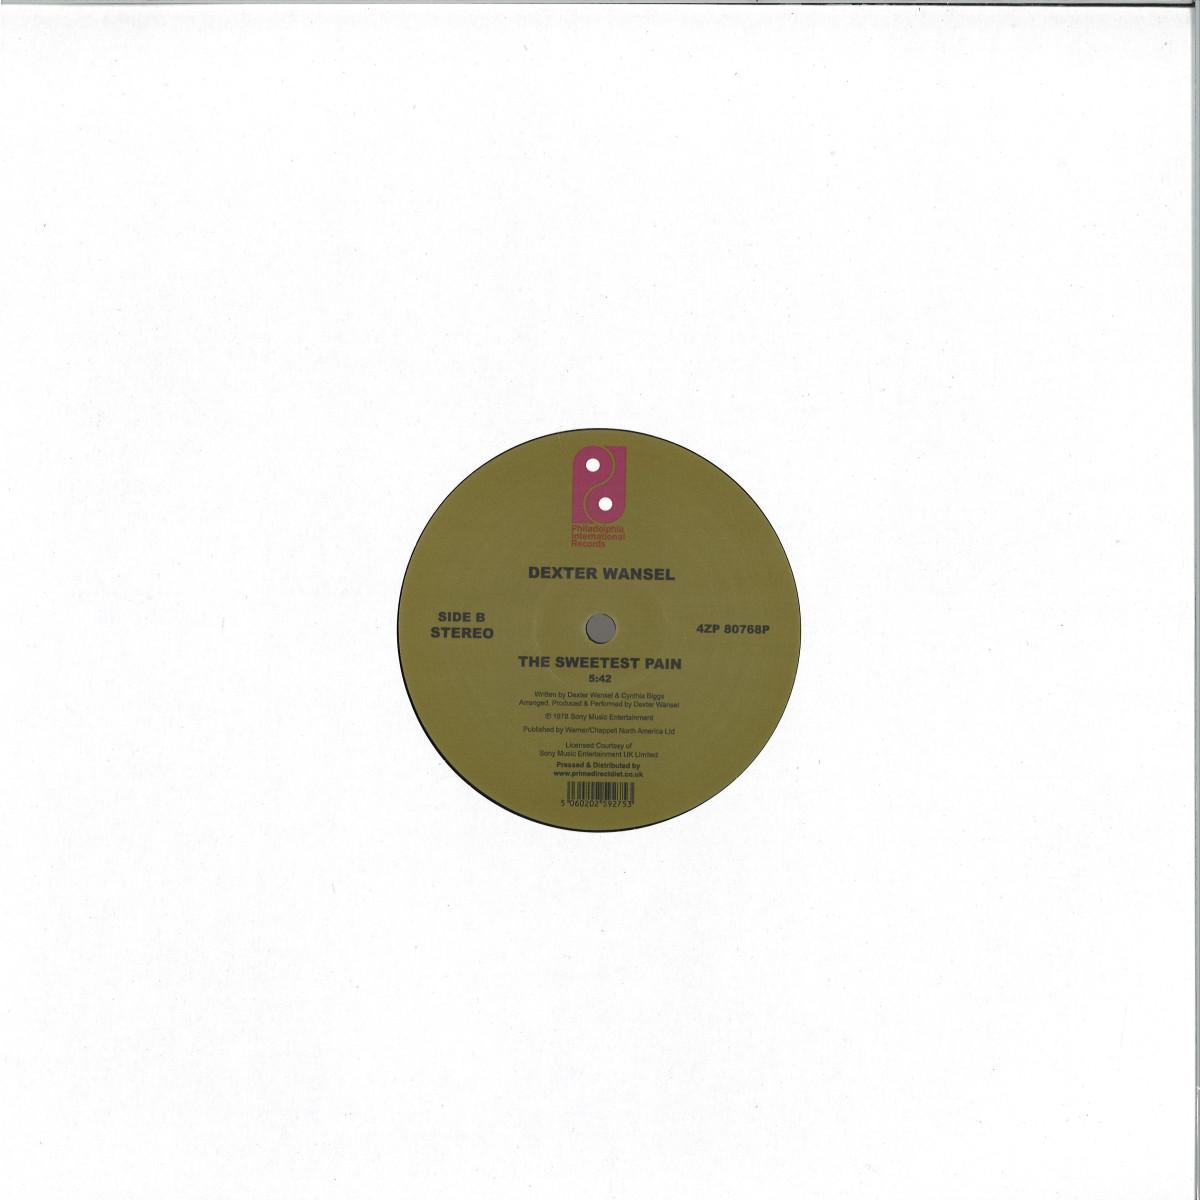 Dexter Wansel Life On Mars The Sweetest Pain Philadelphia International Rec 4zp80768p Vinyl